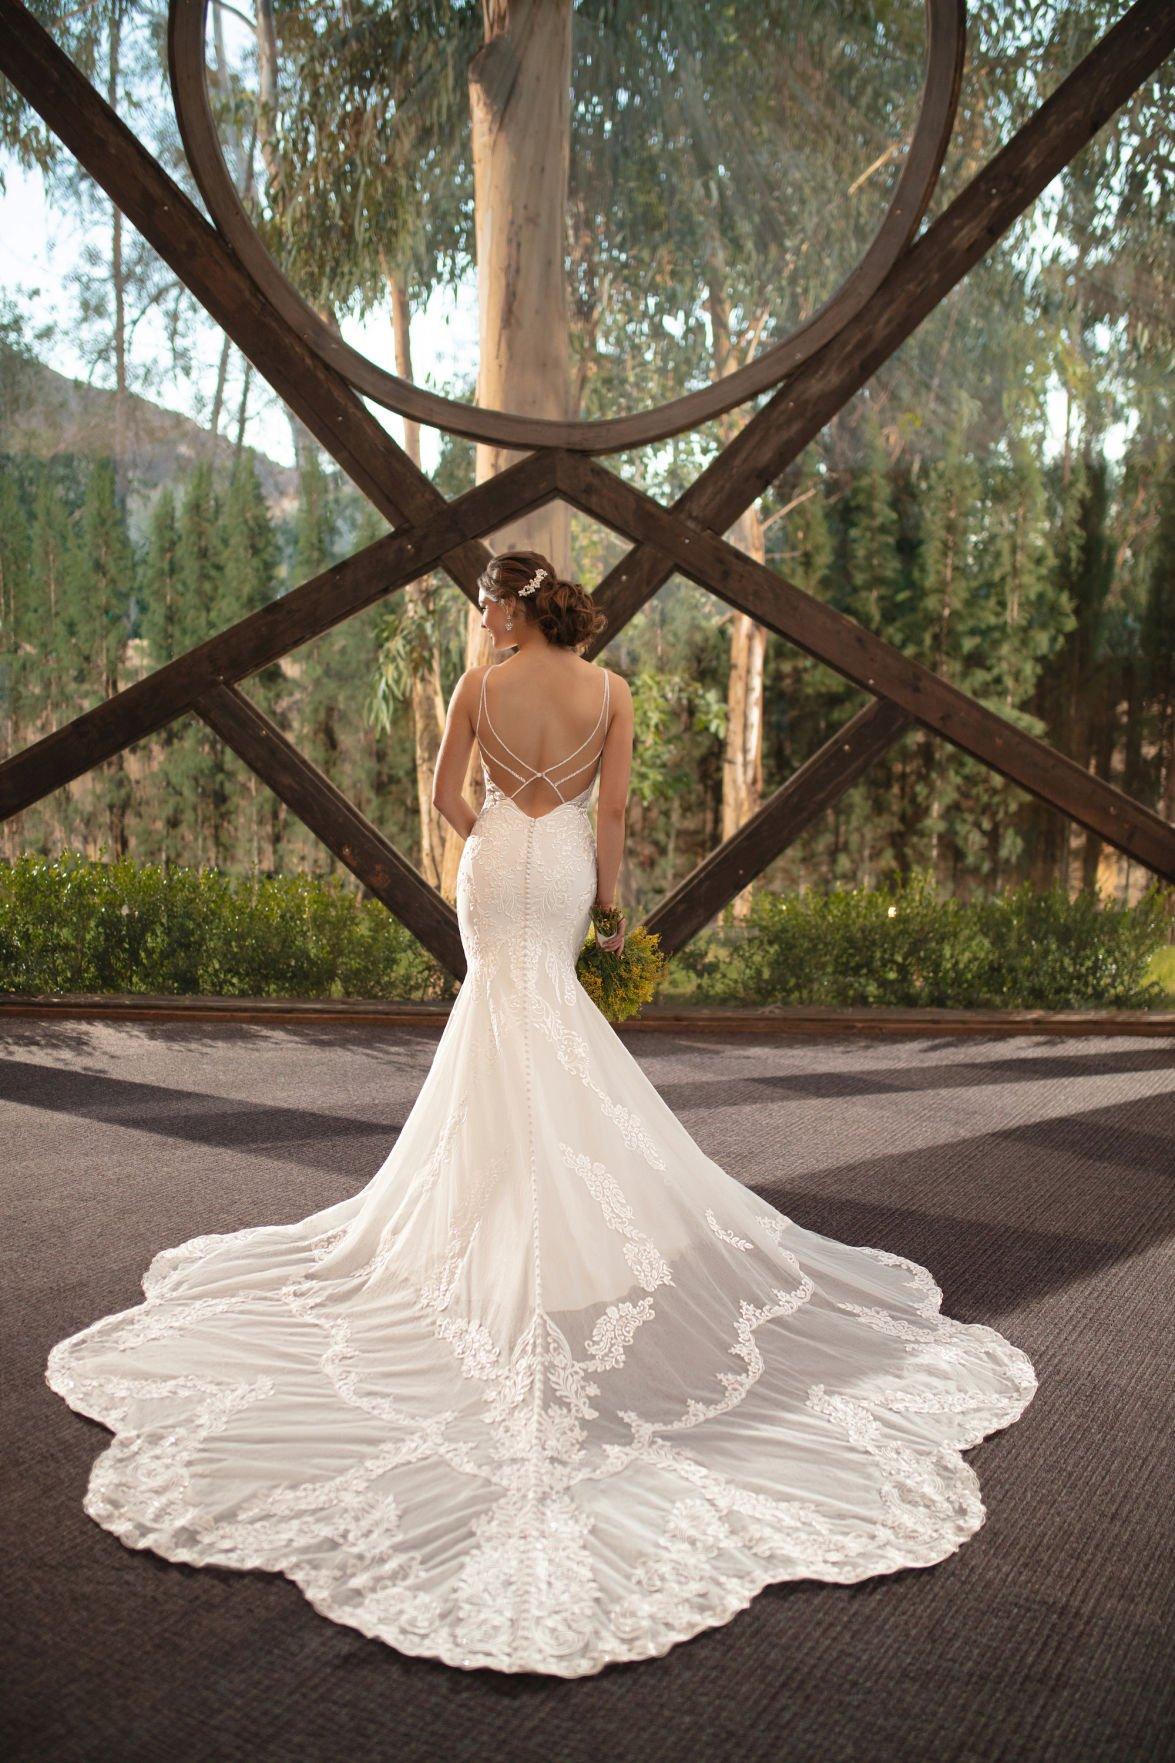 MAEME EUREKA WEDDING DRESS